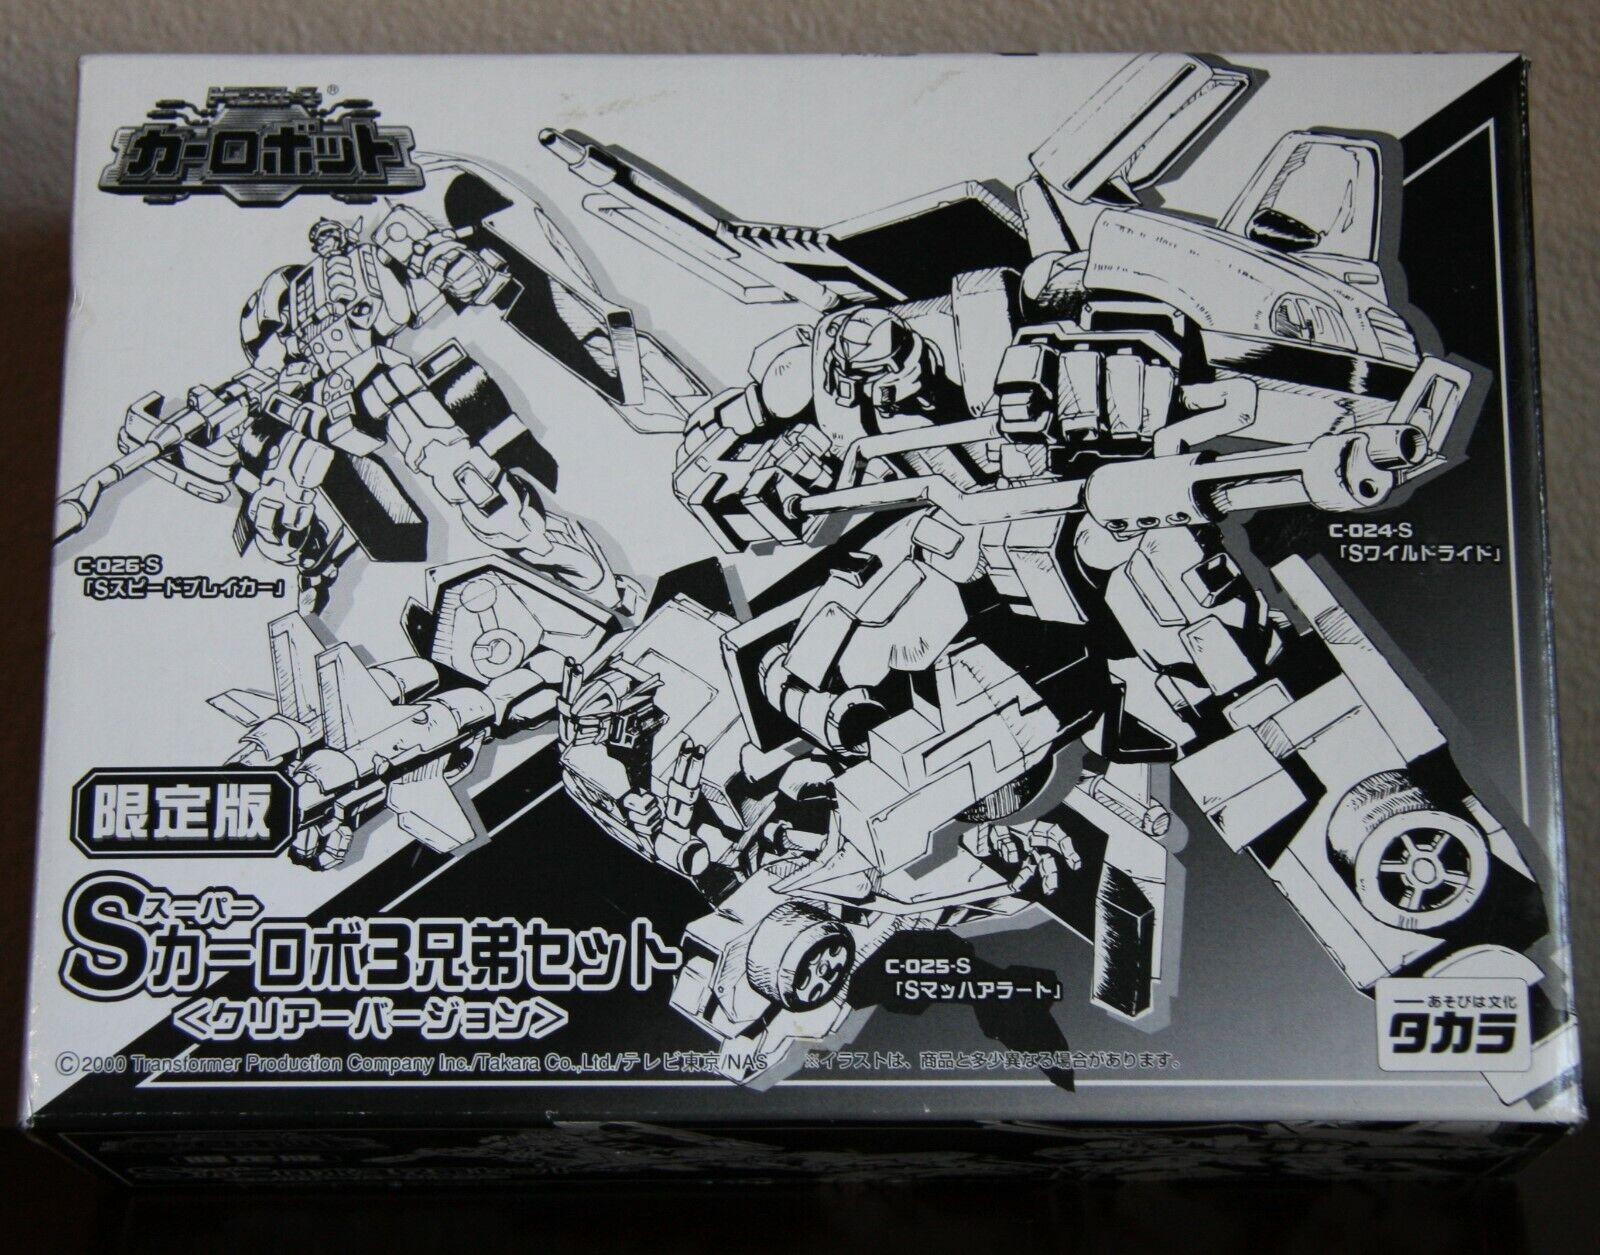 NIB 2000 Limited EditionTransformers RID Takara Clear X-Brawn Prowl Sideburn